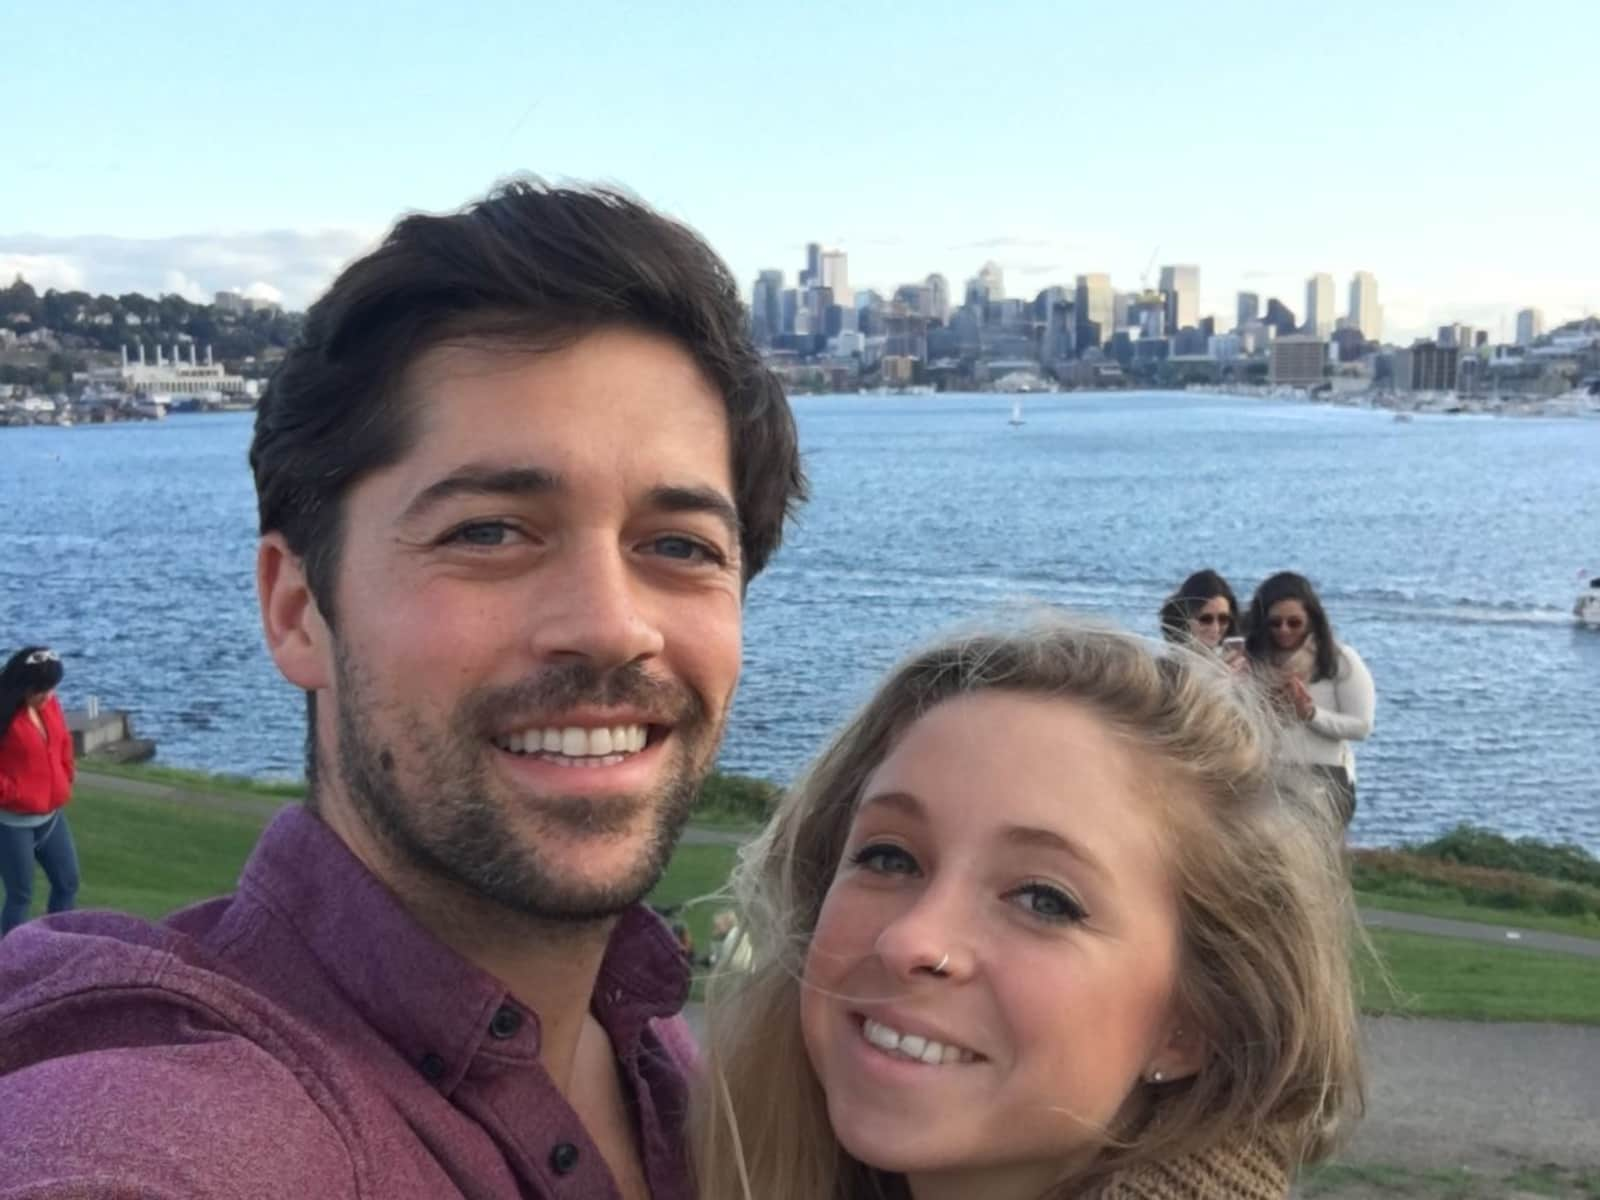 Matthew & Melanie from London, United Kingdom